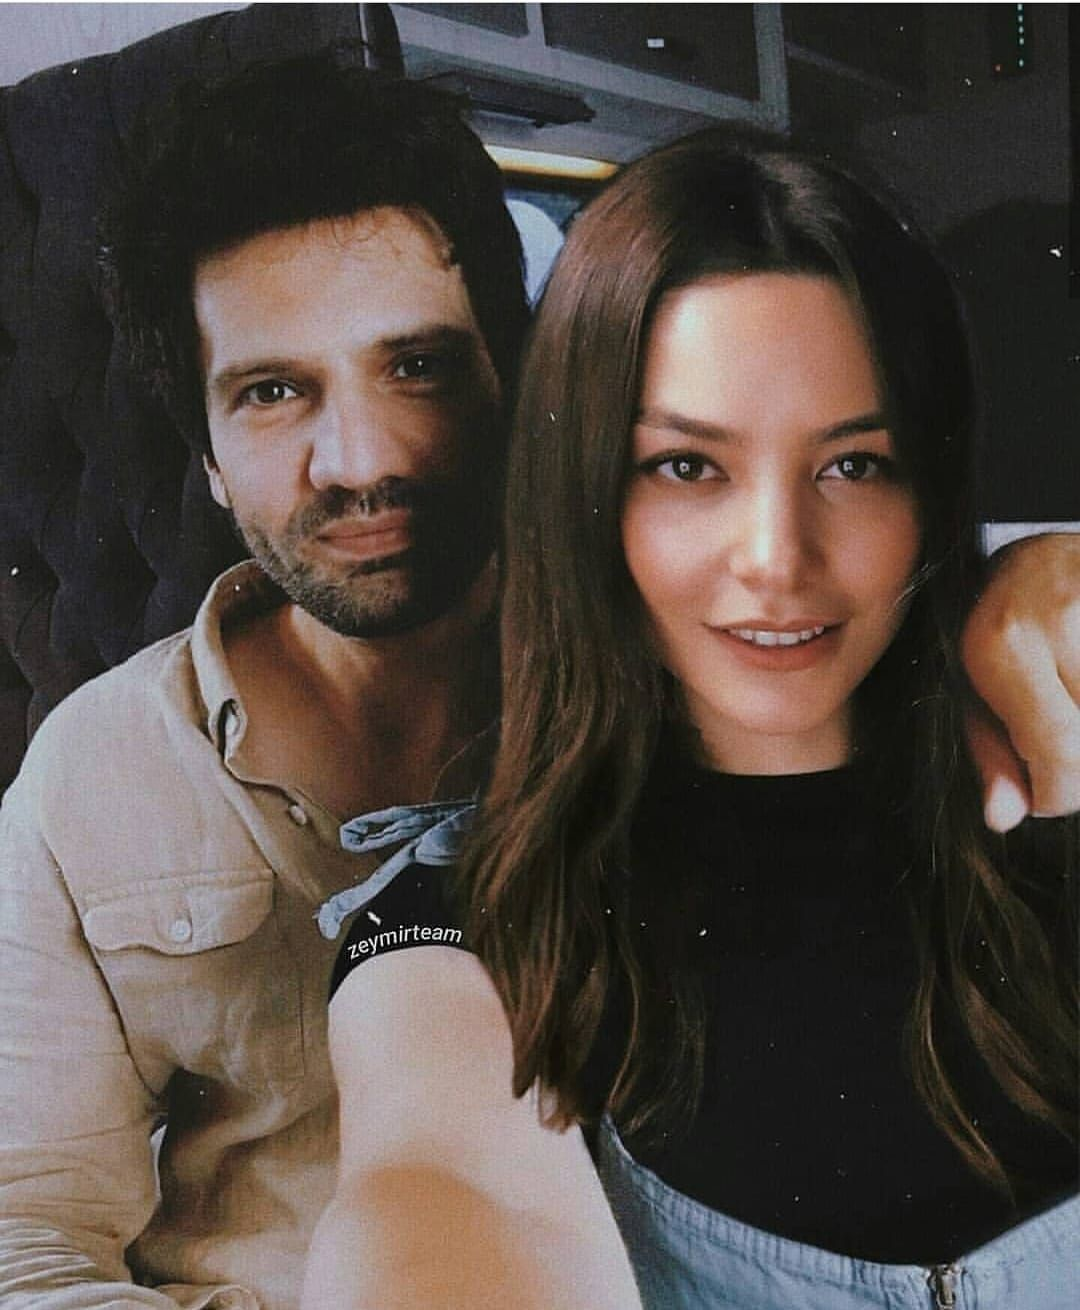 Polubienia 1 250 Komentarze 12 Hazal Filiz Kucukkose Hazalfilizkucukkse Na Instagramie Hello Hazalfilizku Tv Show Couples Turkish Men Turkish Film